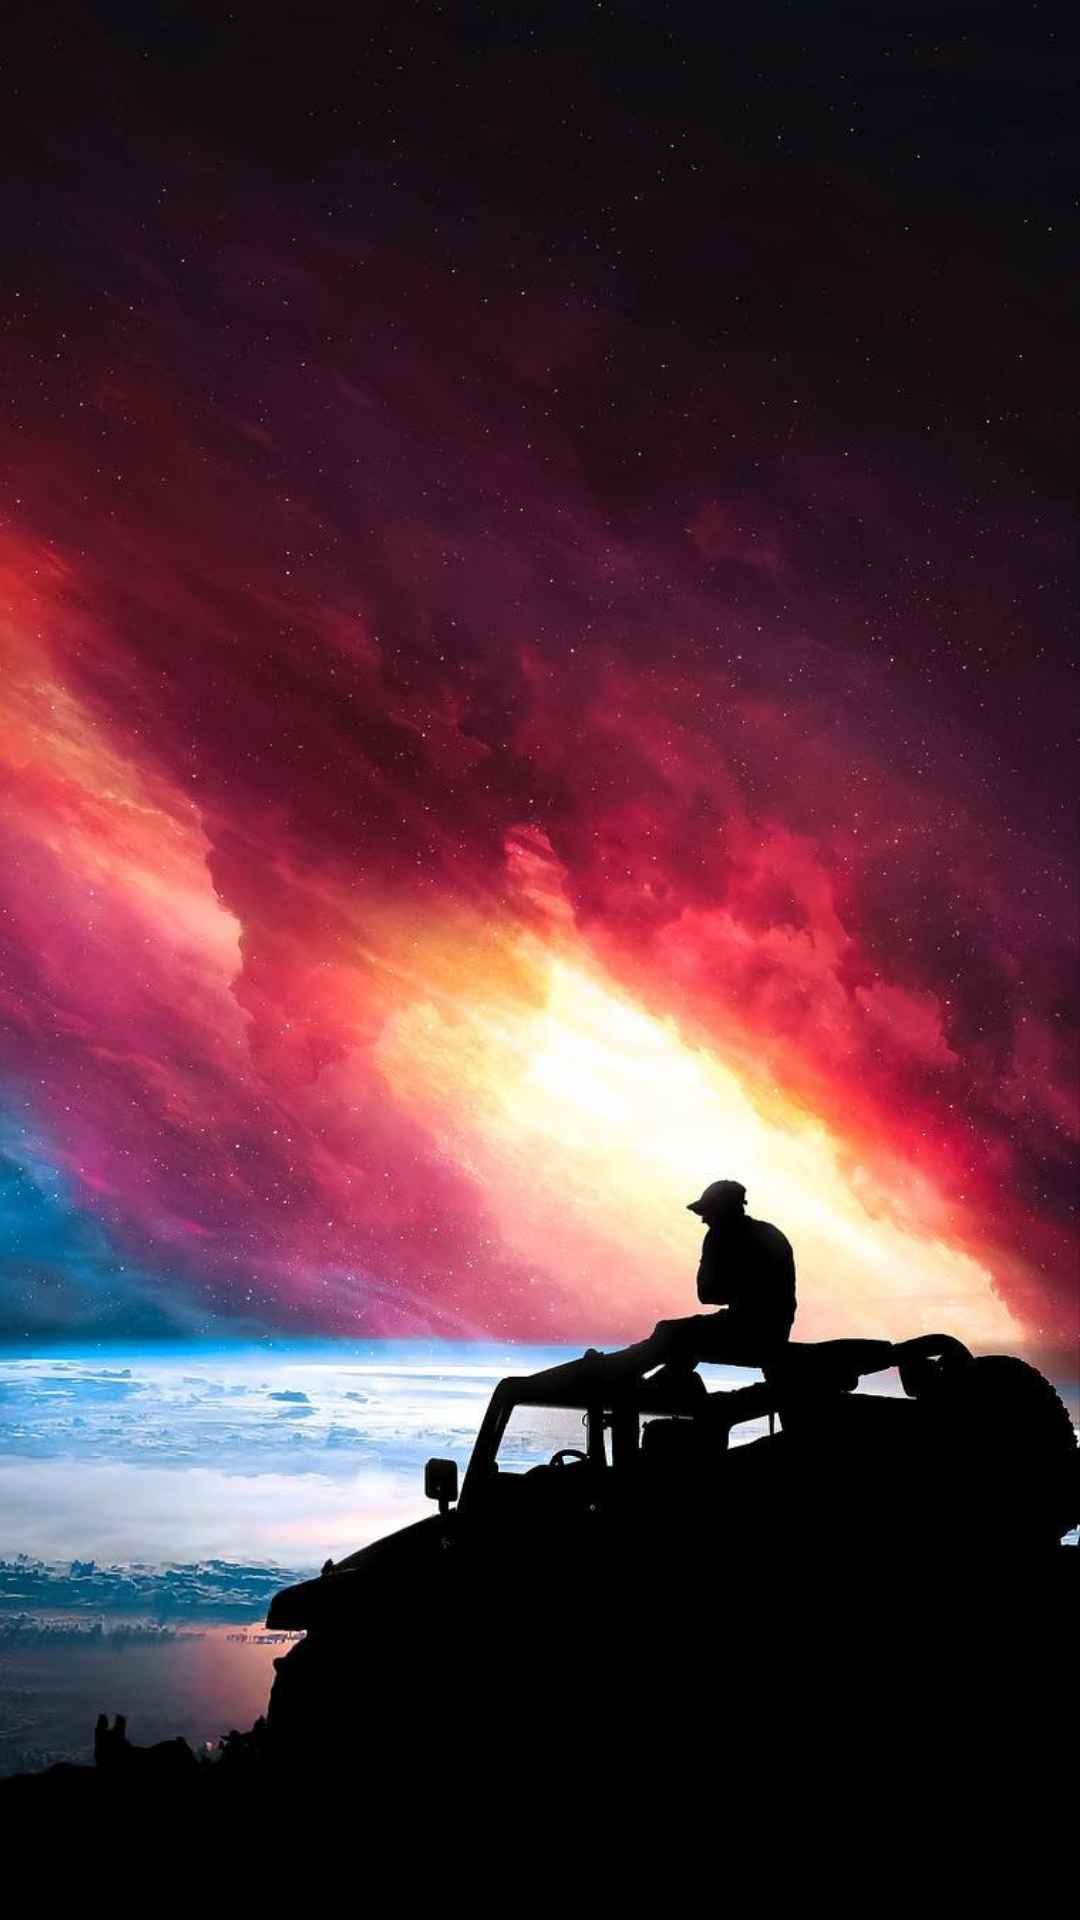 Jeep Adventures in Space iPhone Wallpaper